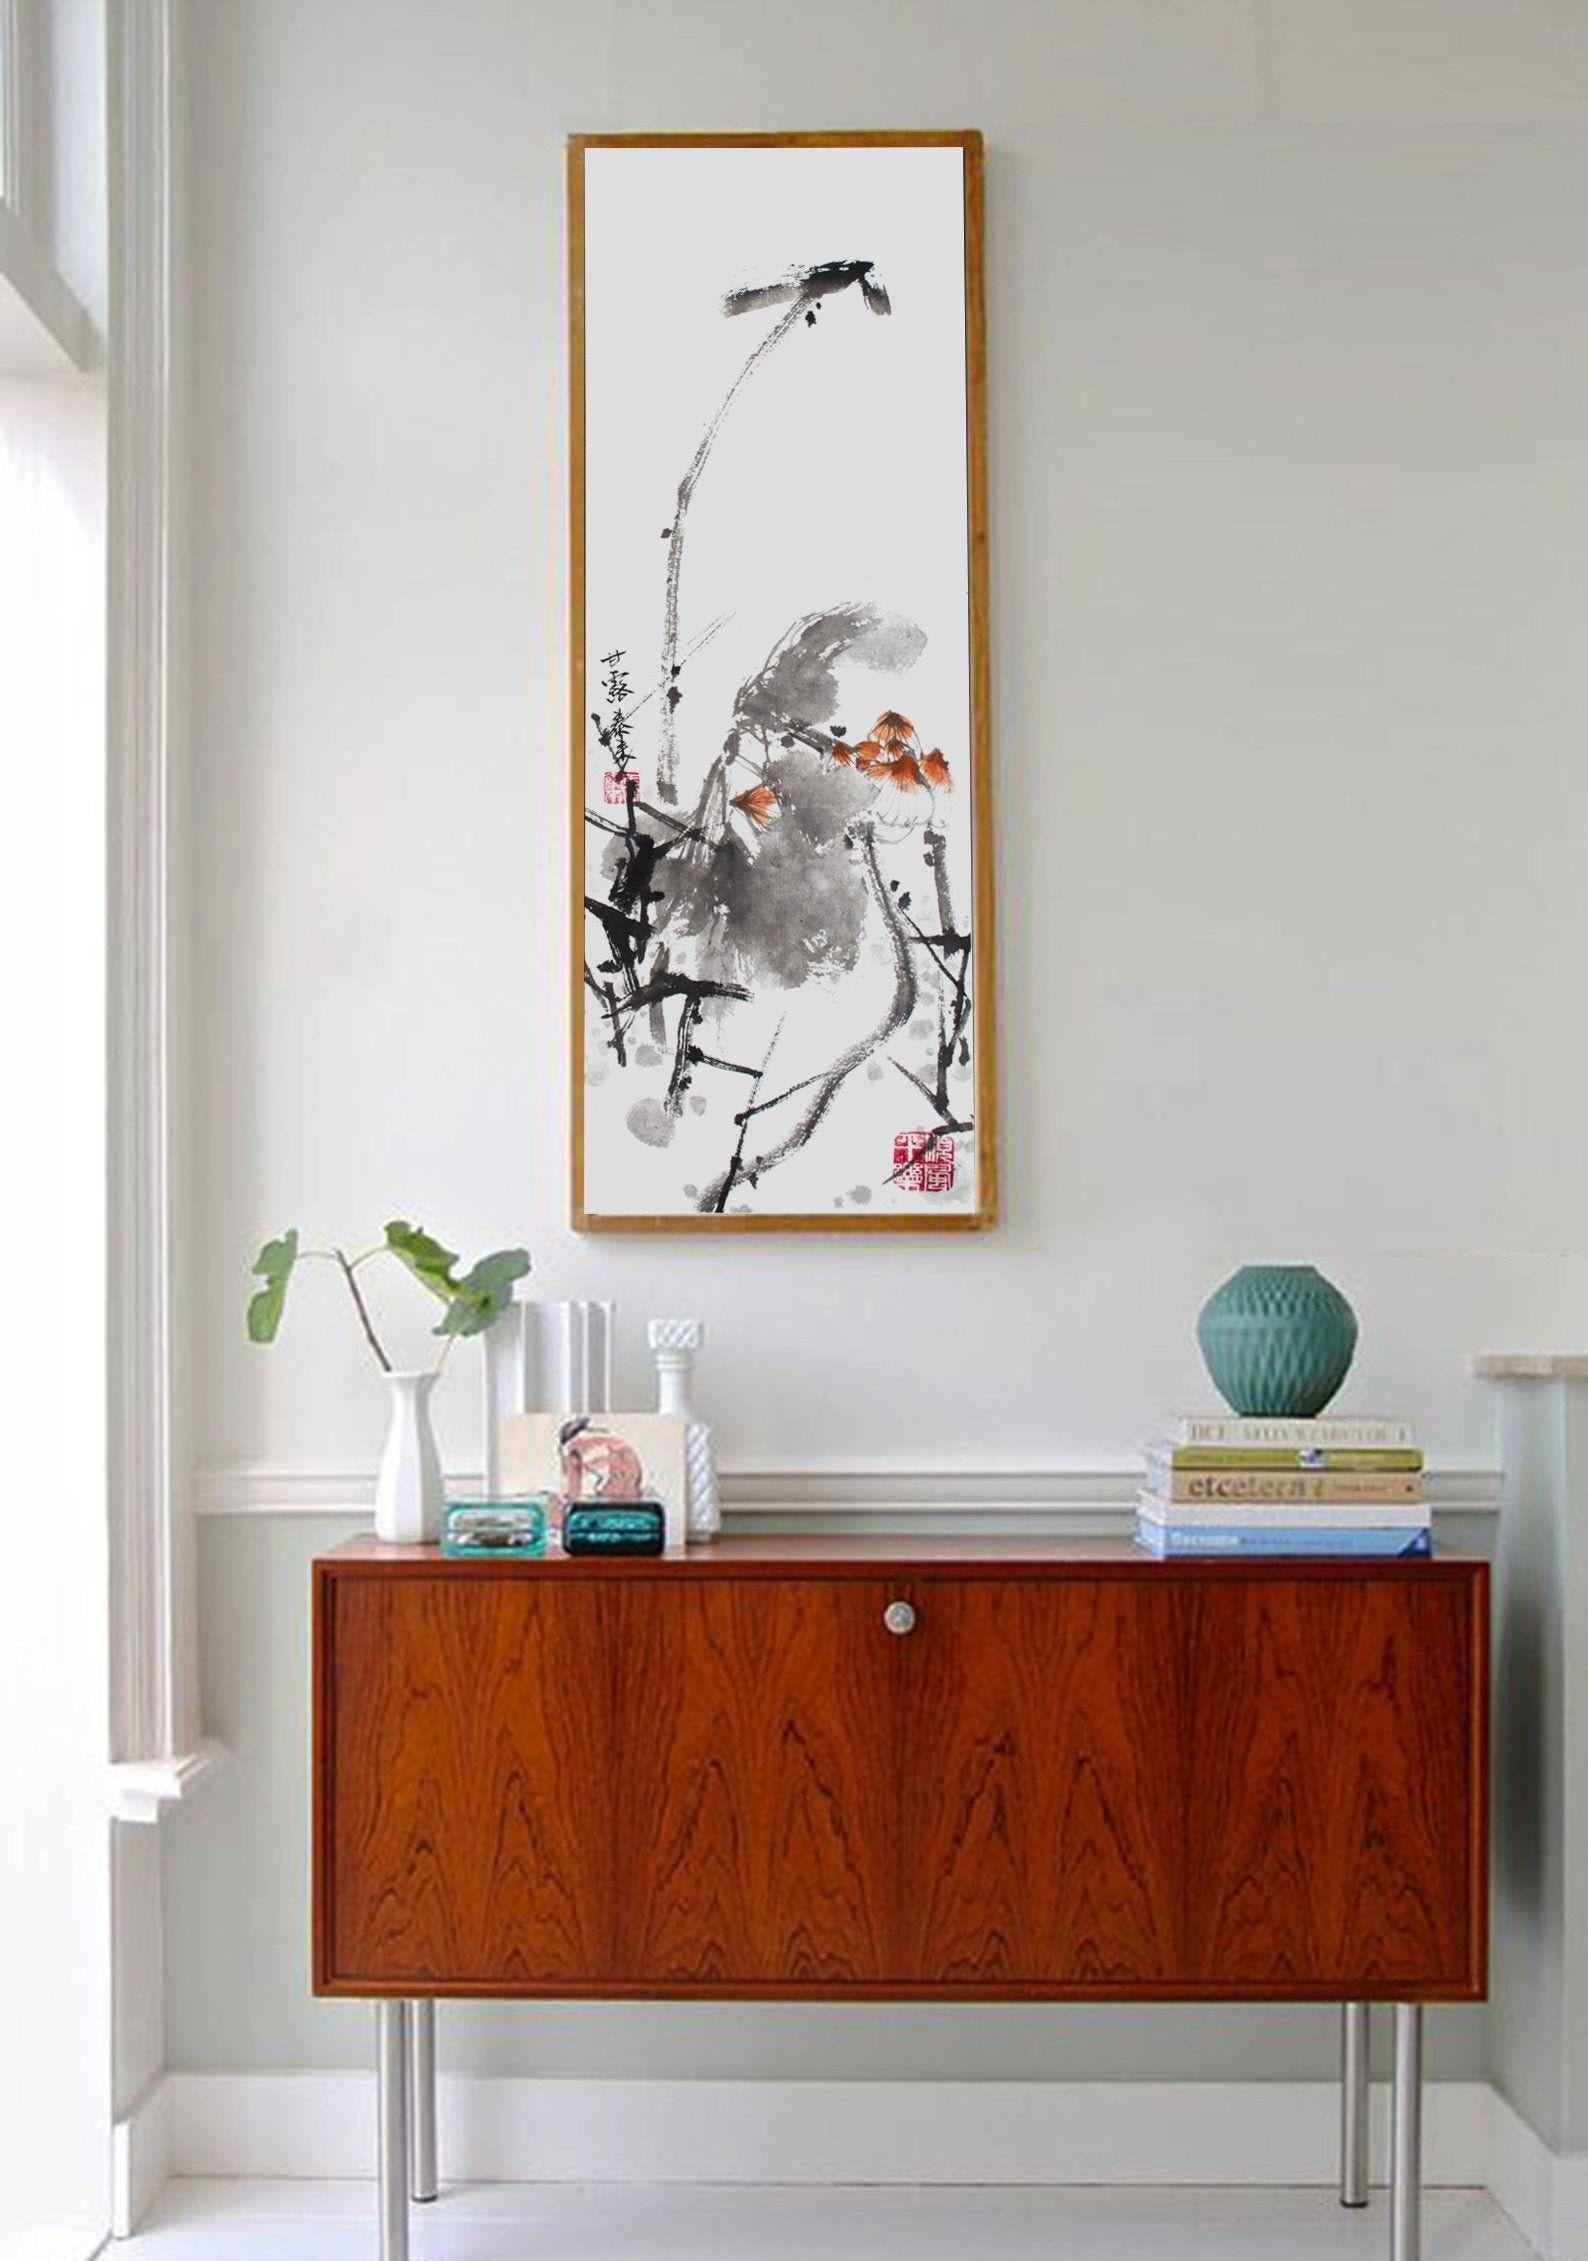 Lotus Chinese And Japanese Ink Painting Office And Home Decor Wall Art Tuschemalerei Painting Und Chinesische Malerei